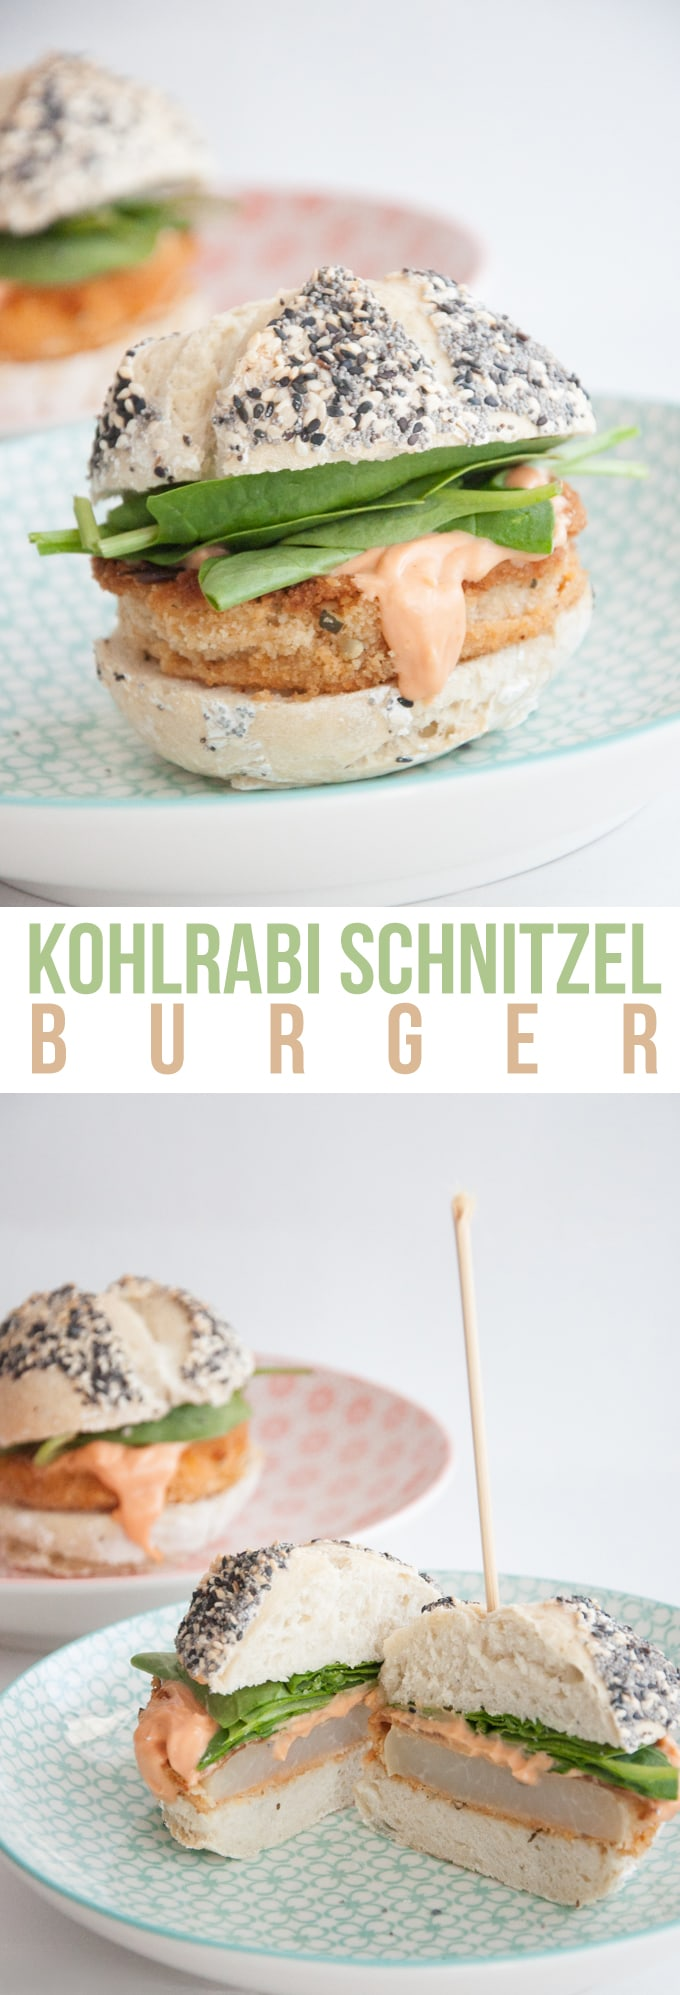 Kohlrabi Schnitzel Burger